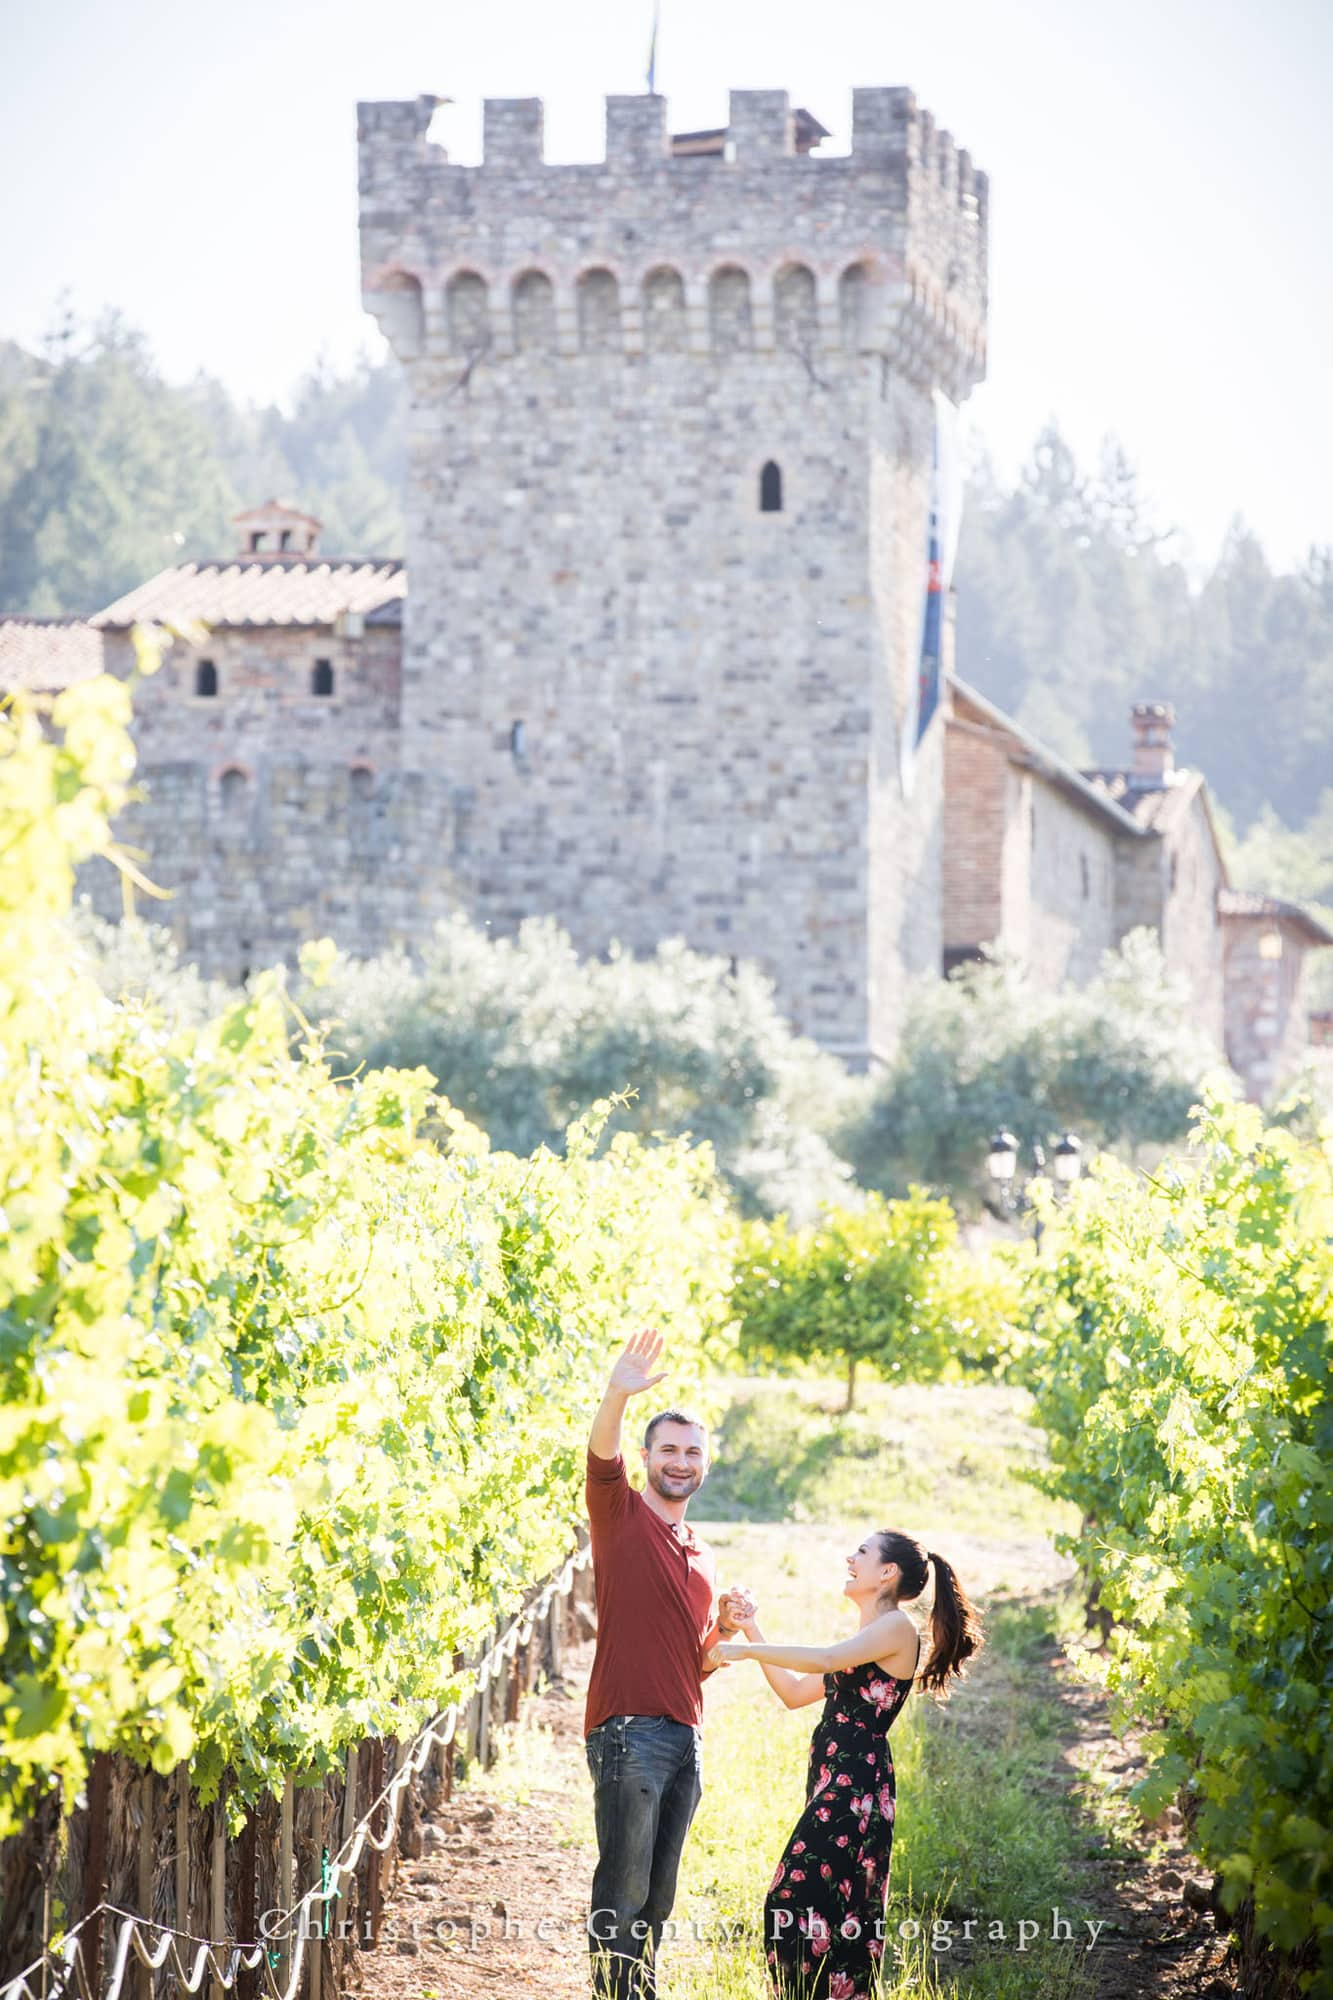 Castello di Amorosa Marriage Proposal Photography 303